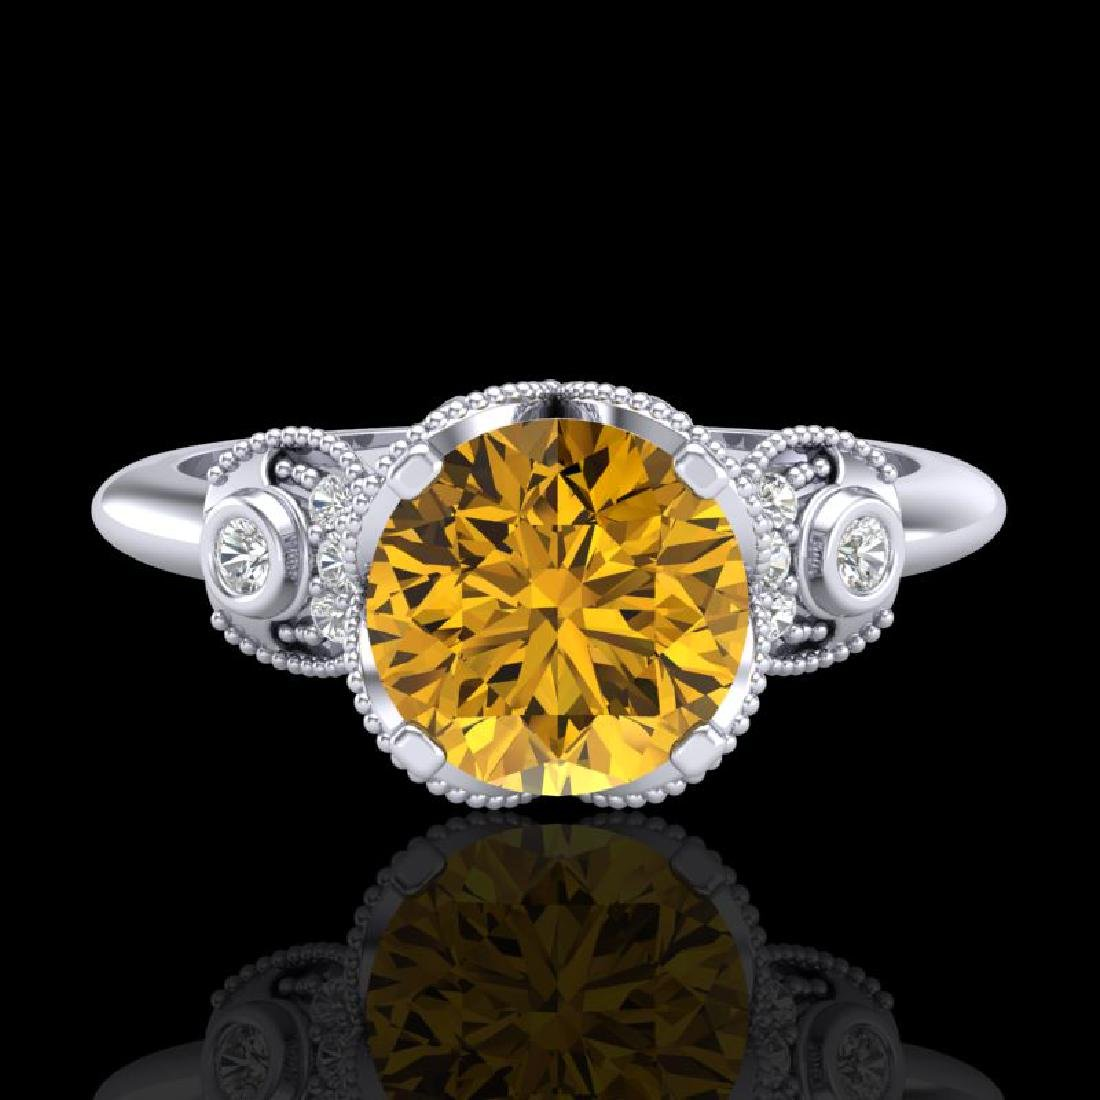 1.75 CTW Intense Fancy Yellow Diamond Engagement Art - 2